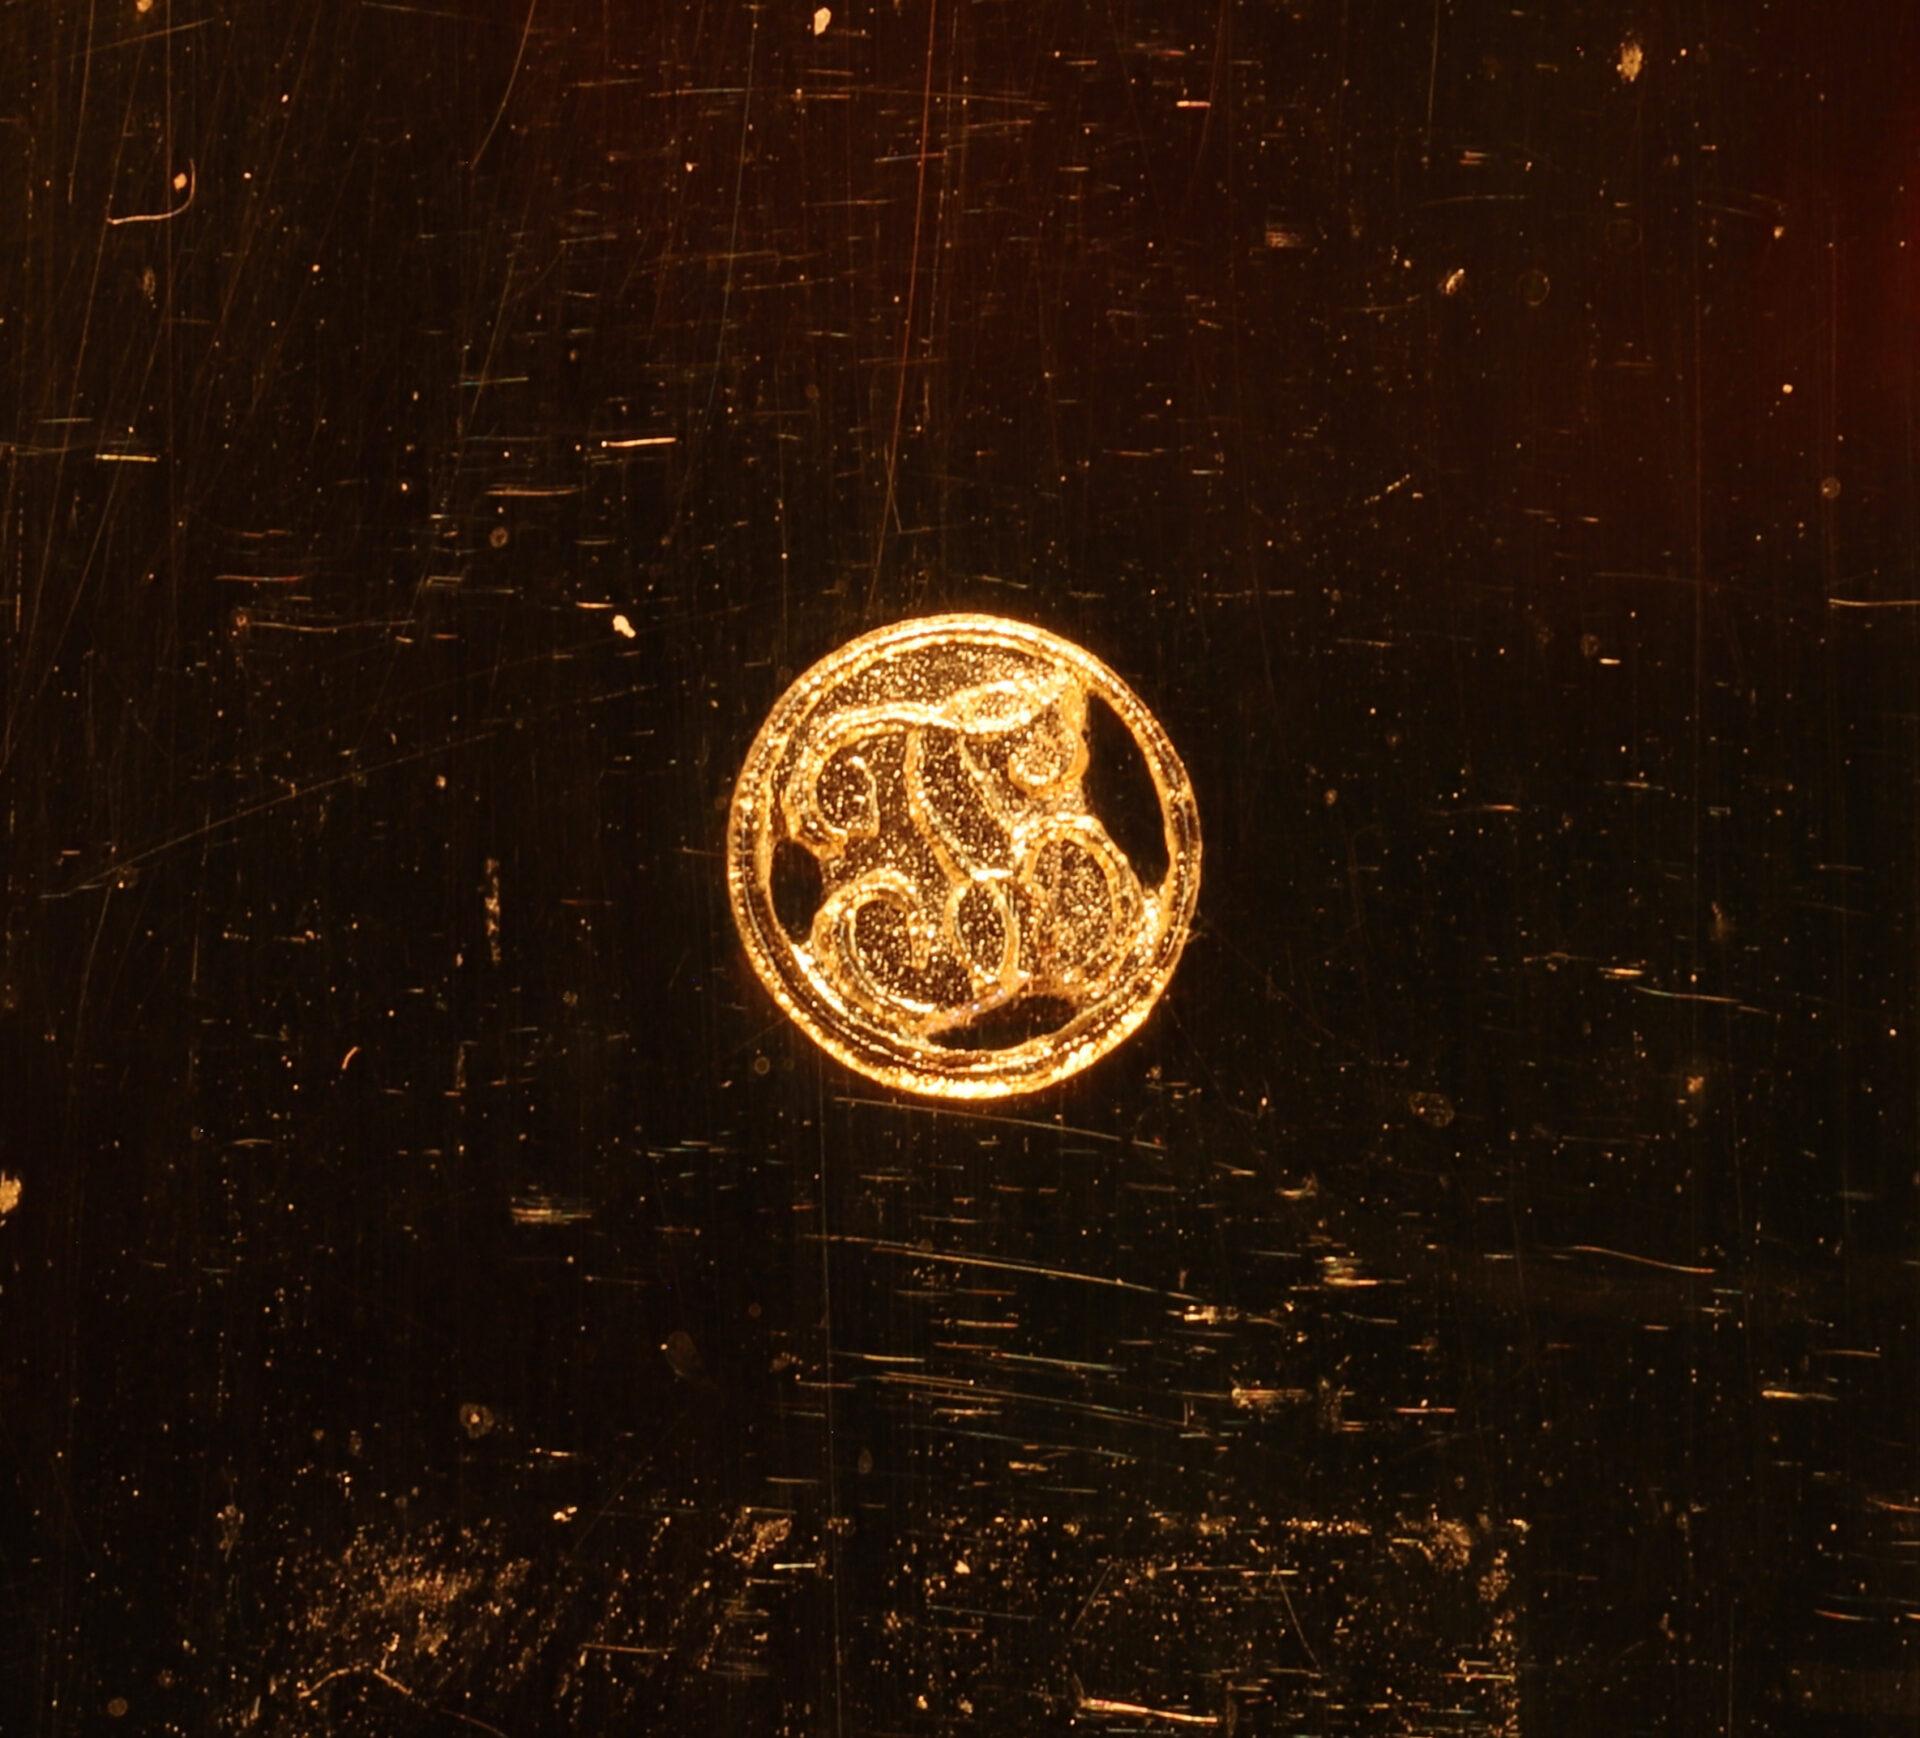 Close up of logogram from Jules Richard Bourdon Barometer No 45028 c1900